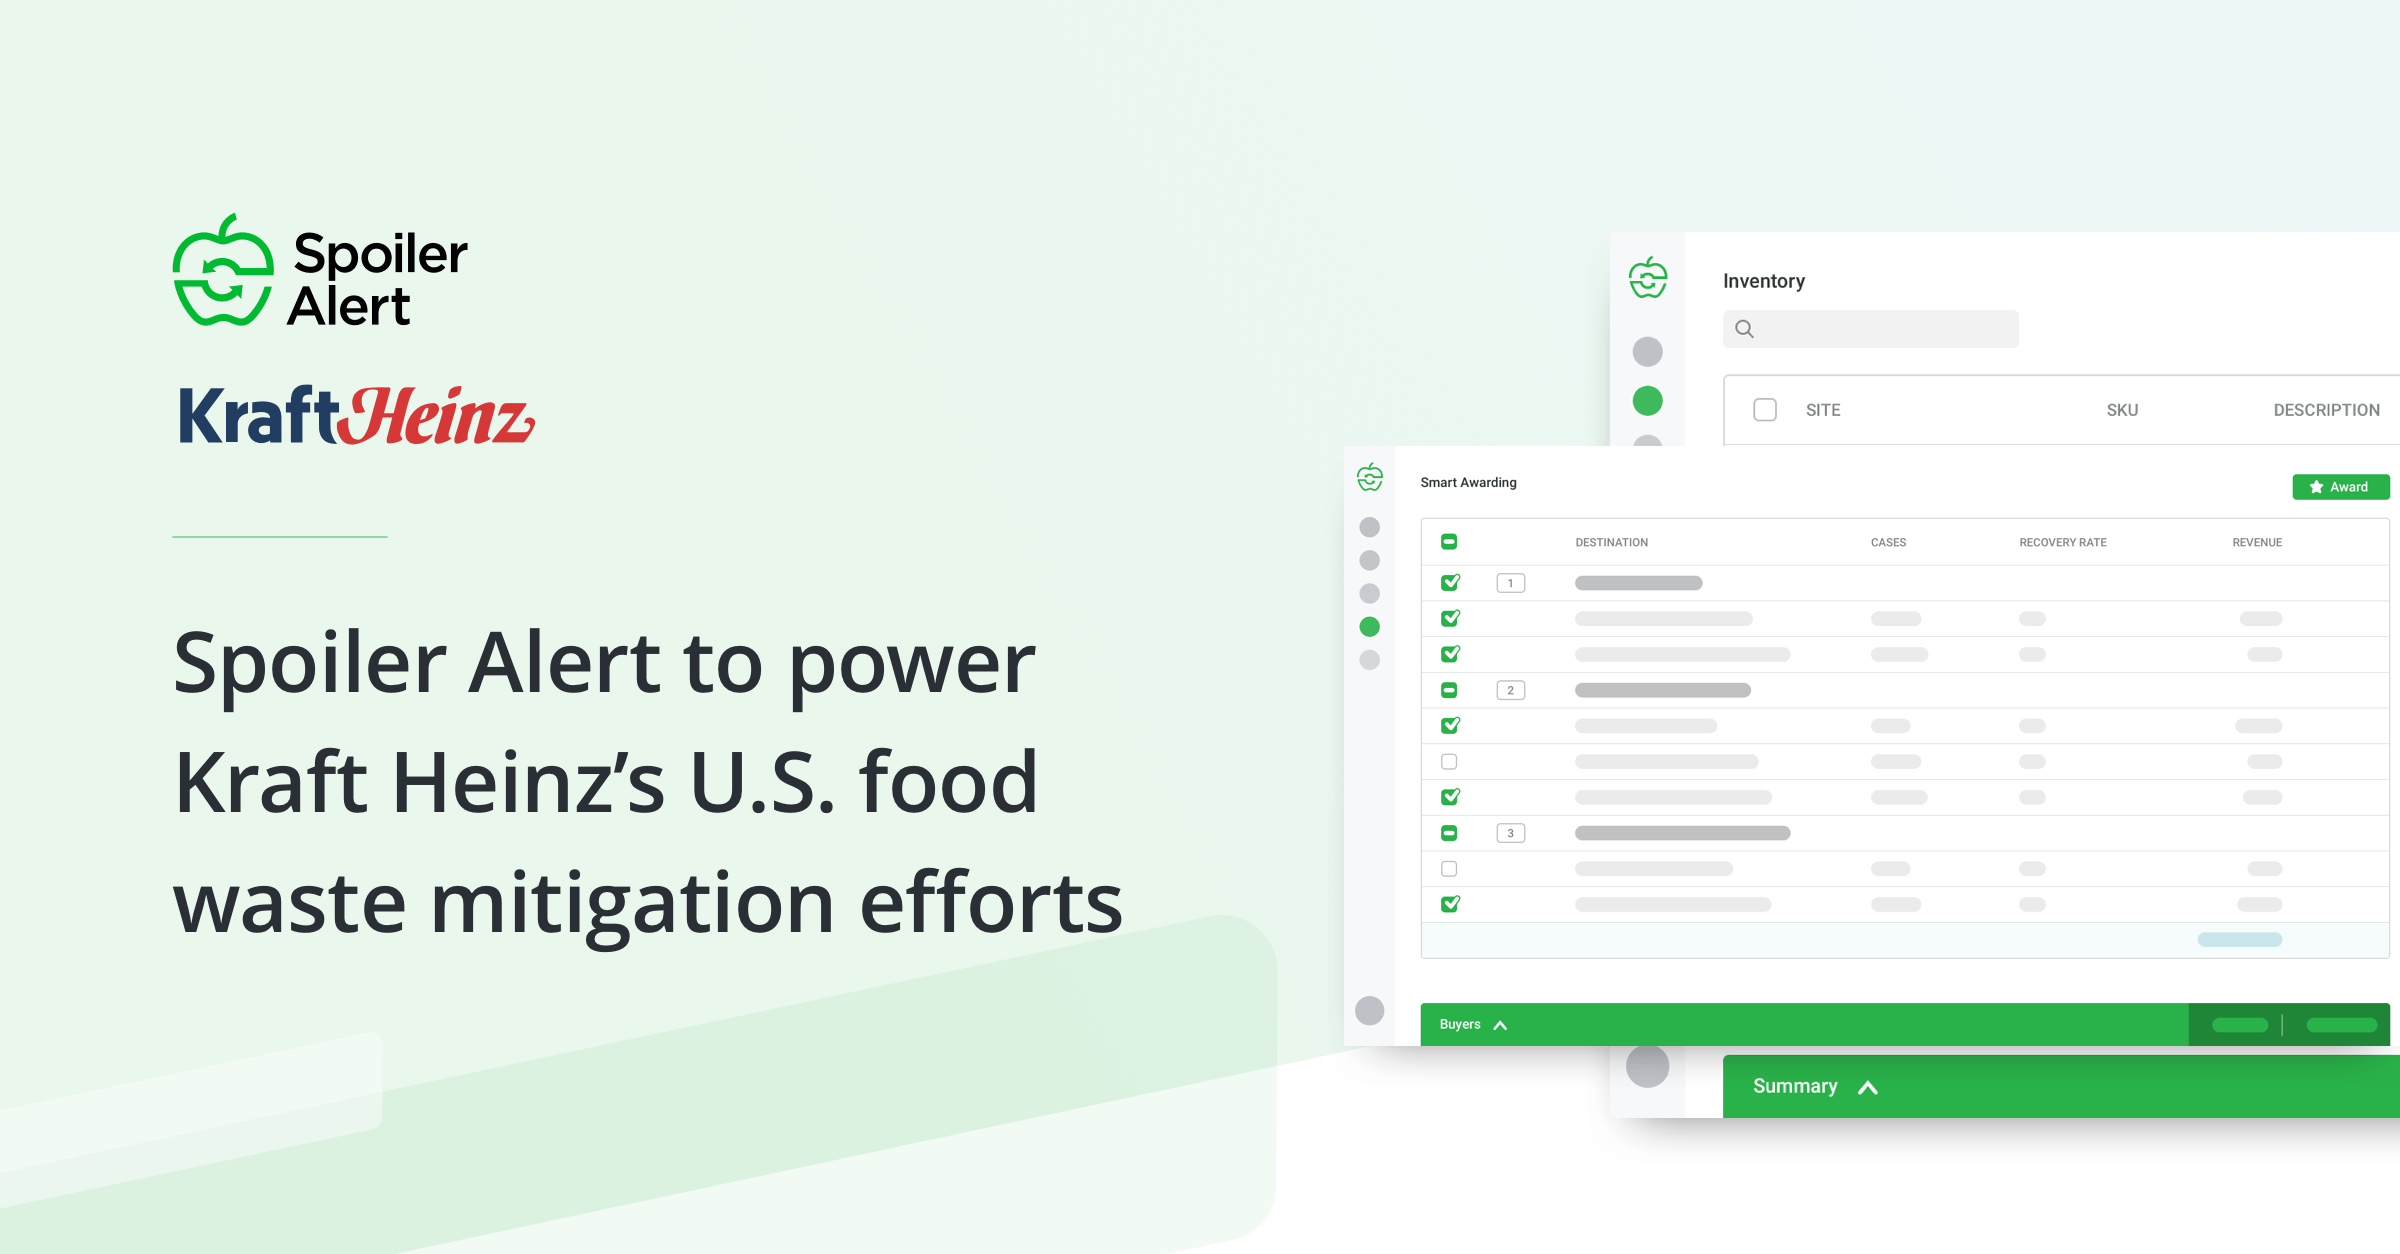 Spoiler Alert to Power Kraft Heinz's U.S. Food Waste Mitigation Efforts